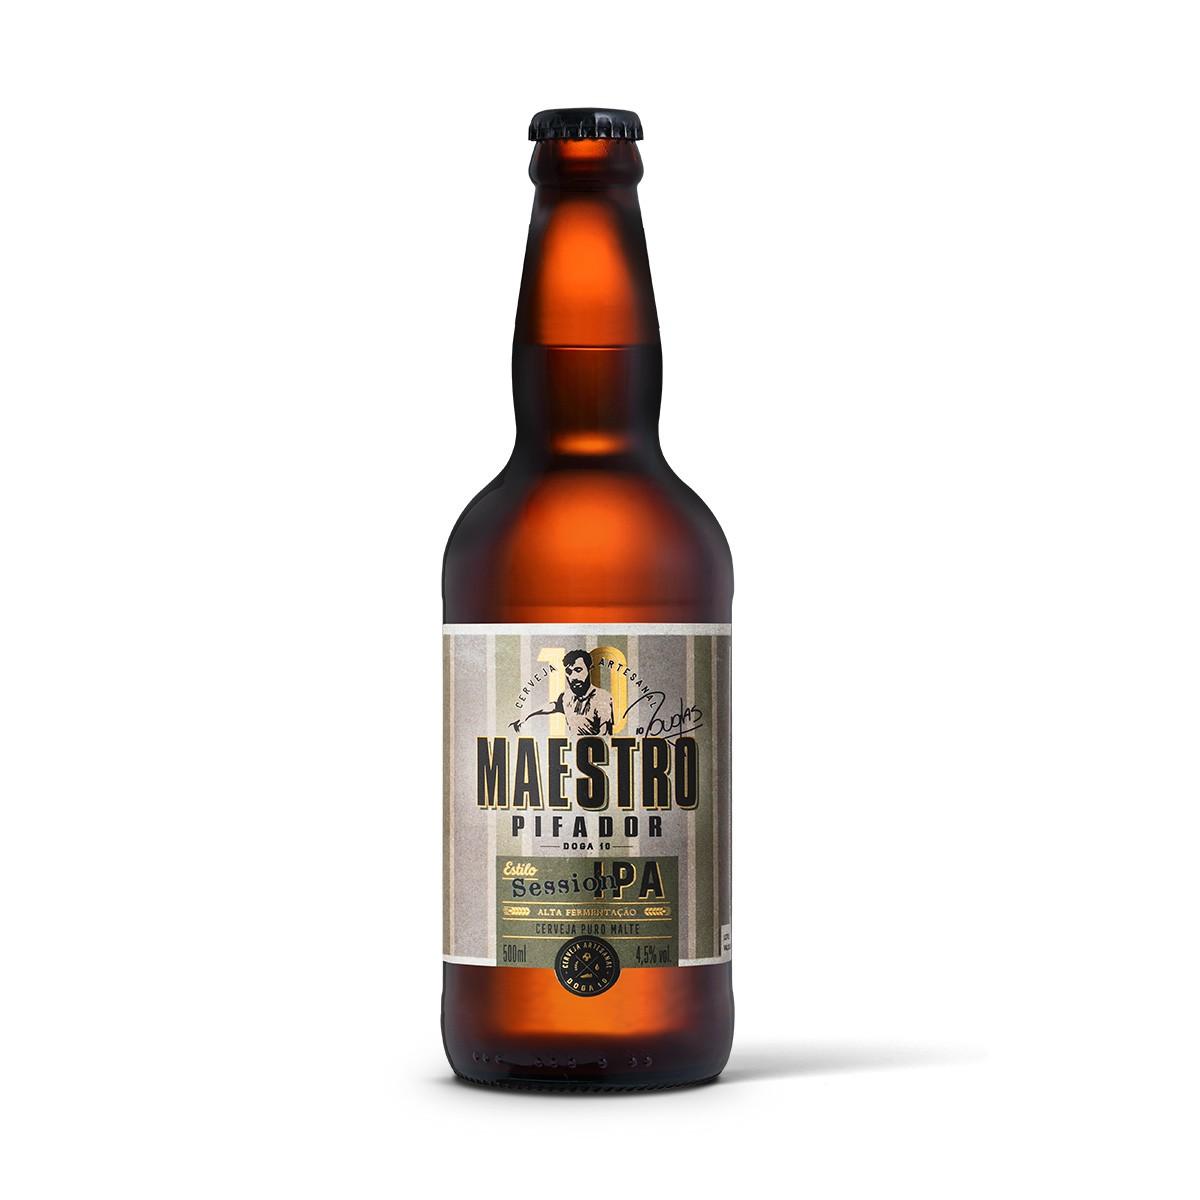 Maestro Pifador Doga 10 Session IPA 500ml  - RS BEER - Cervejas Gaúchas